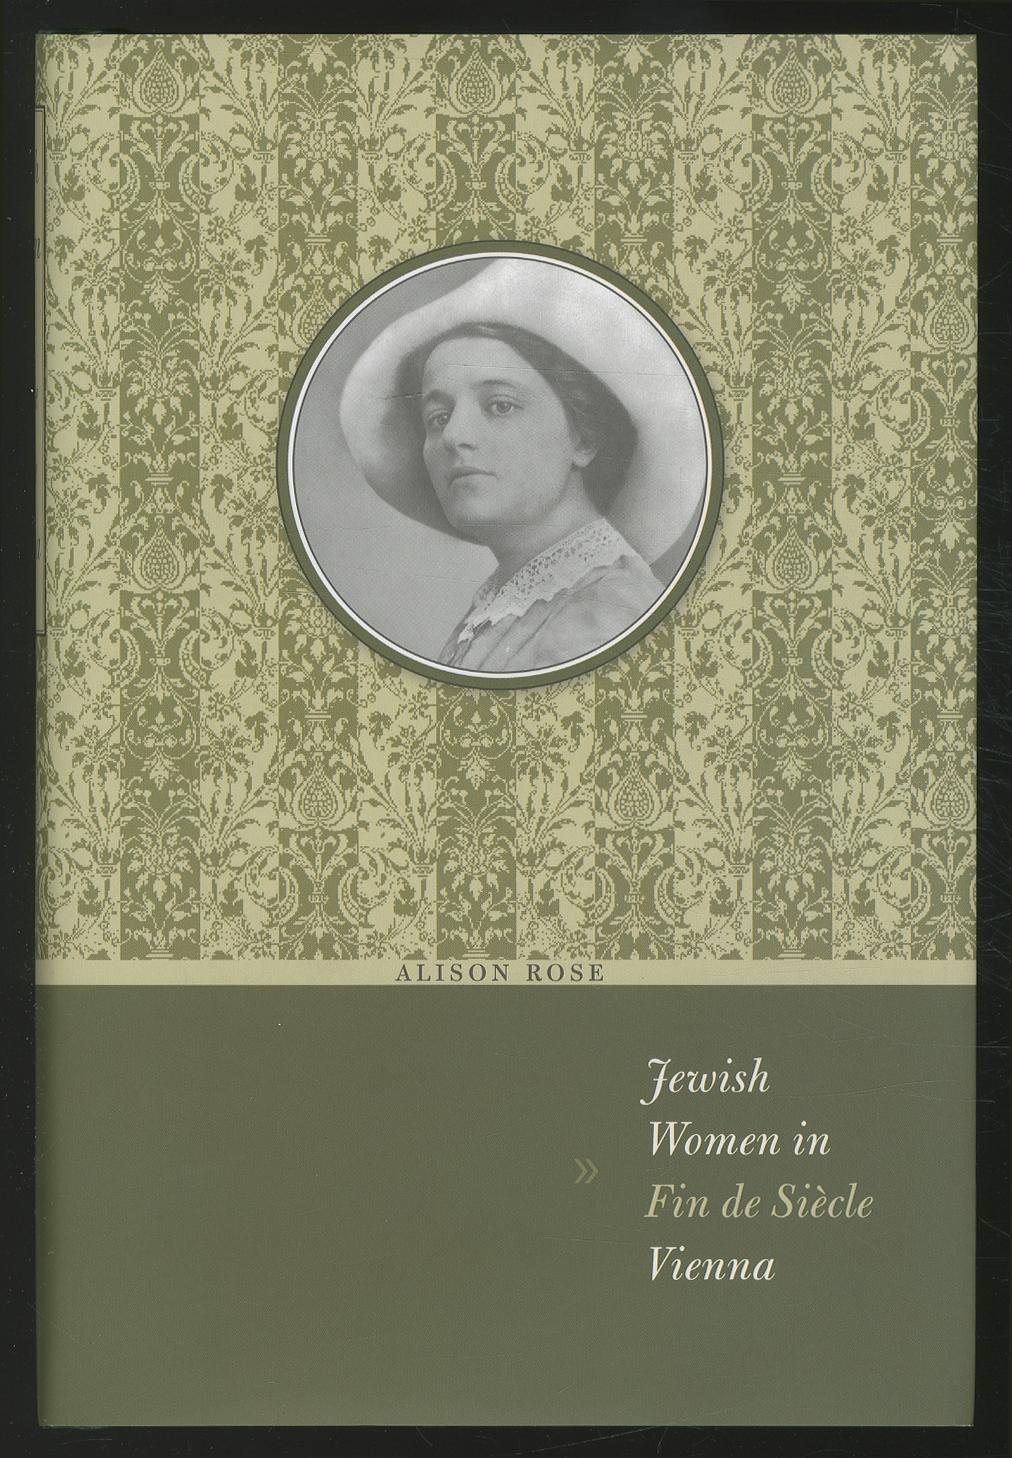 Jewish Women in Fin de Siècle Vienna - ROSE, Alison